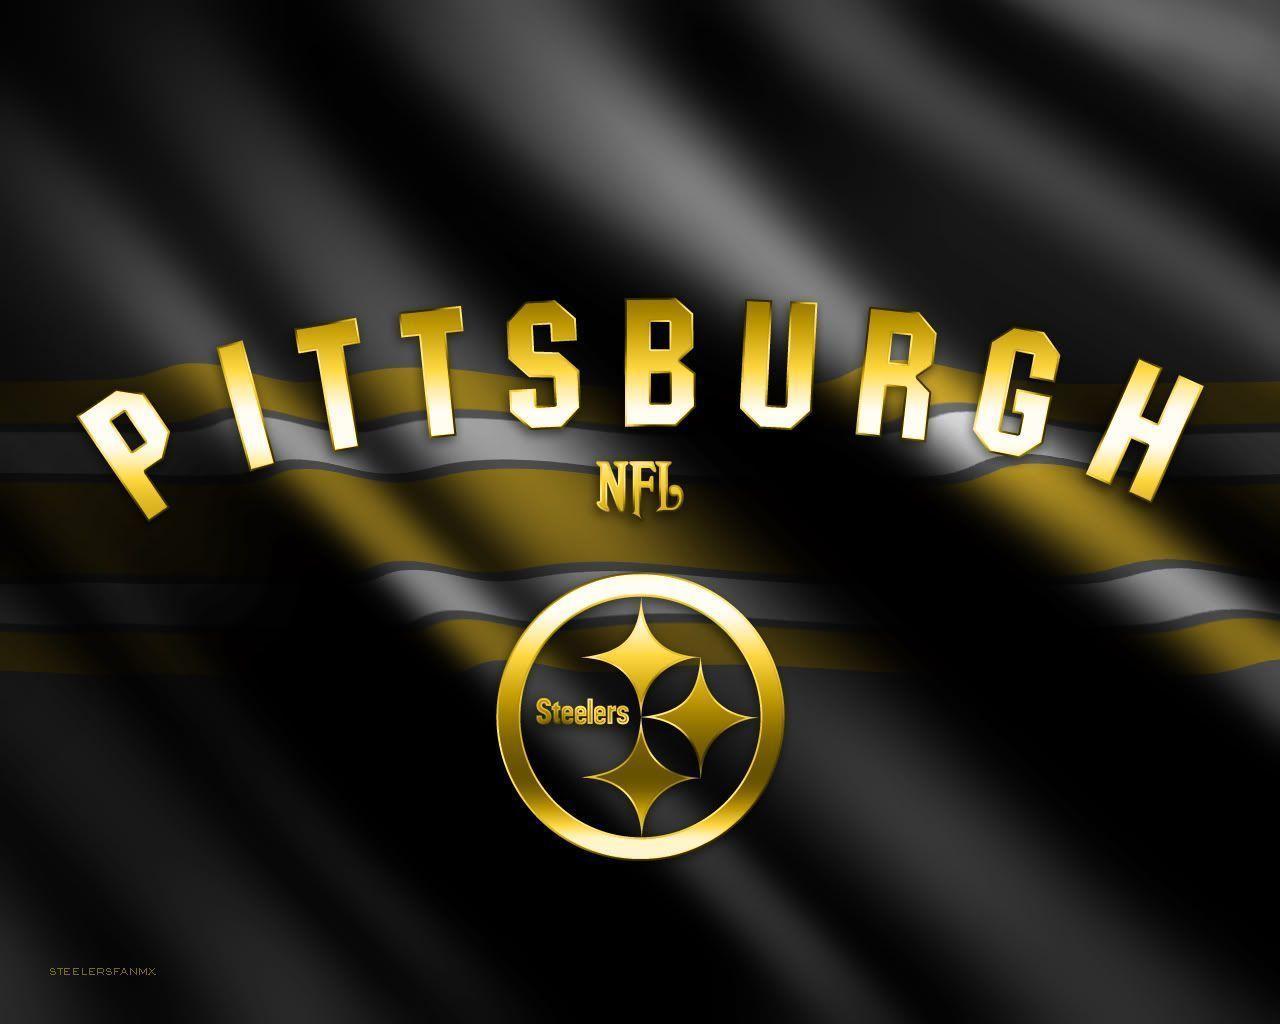 Pittsburgh Steeler NFL Flag 68205 Wallpaper HD Desktop - wallpaperasu